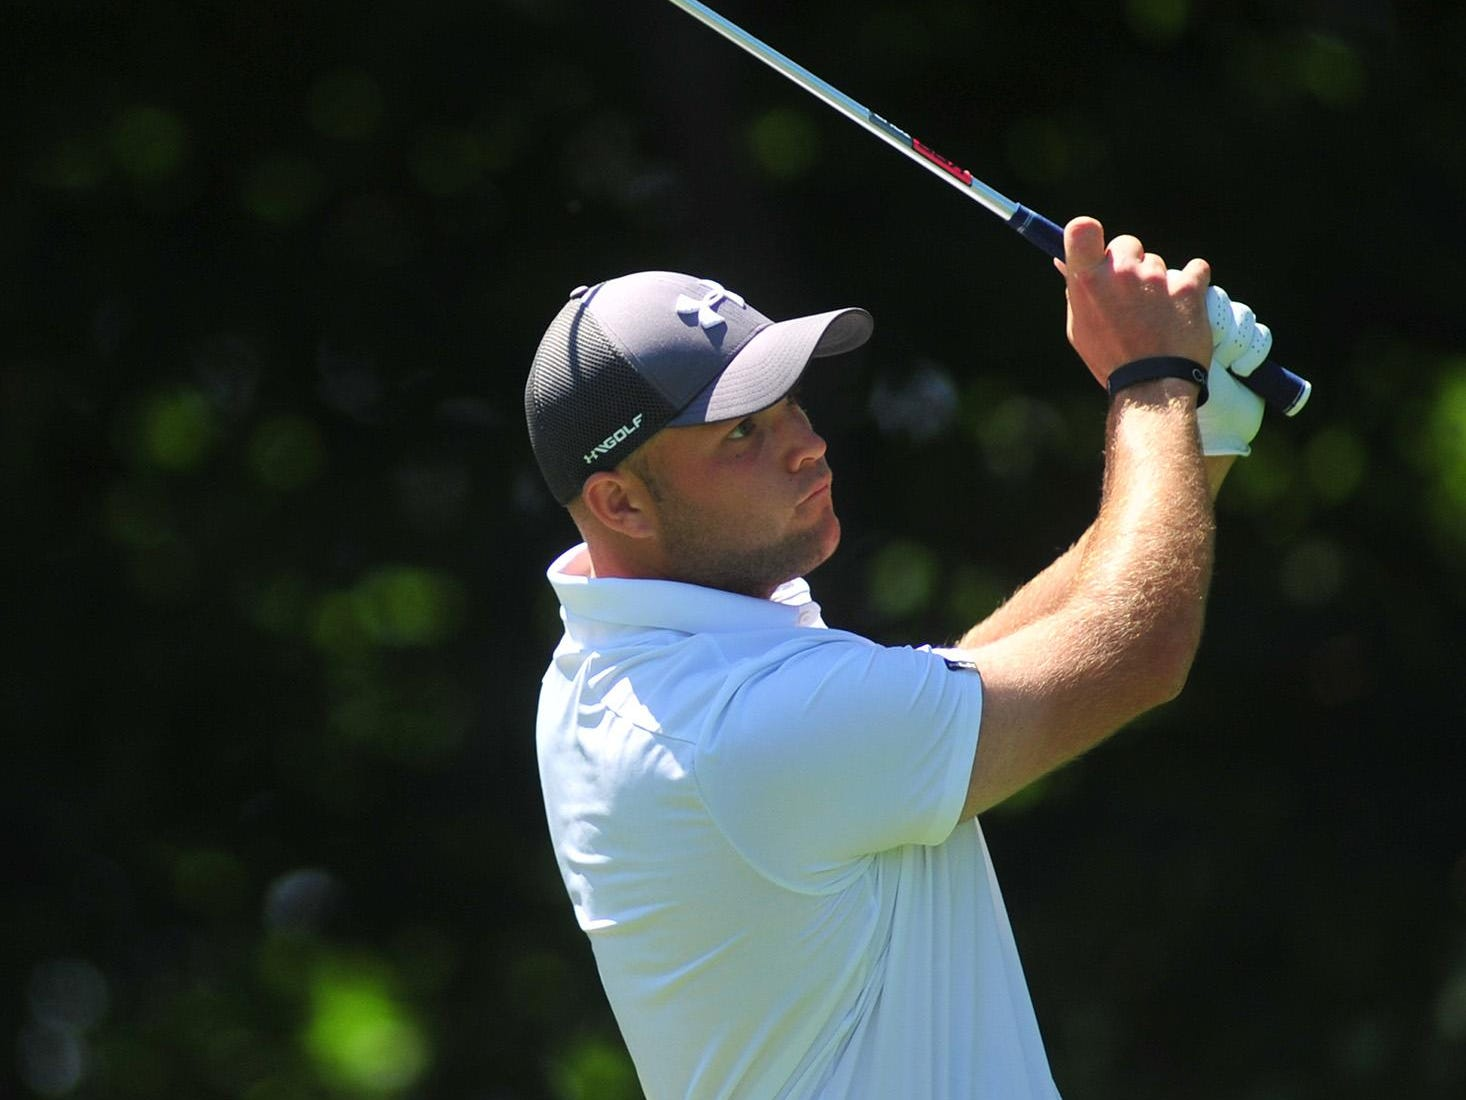 Ryan Snouffer, a Jefferson alumnus, finished third at the New Jersey State Golf Association Open Championship.